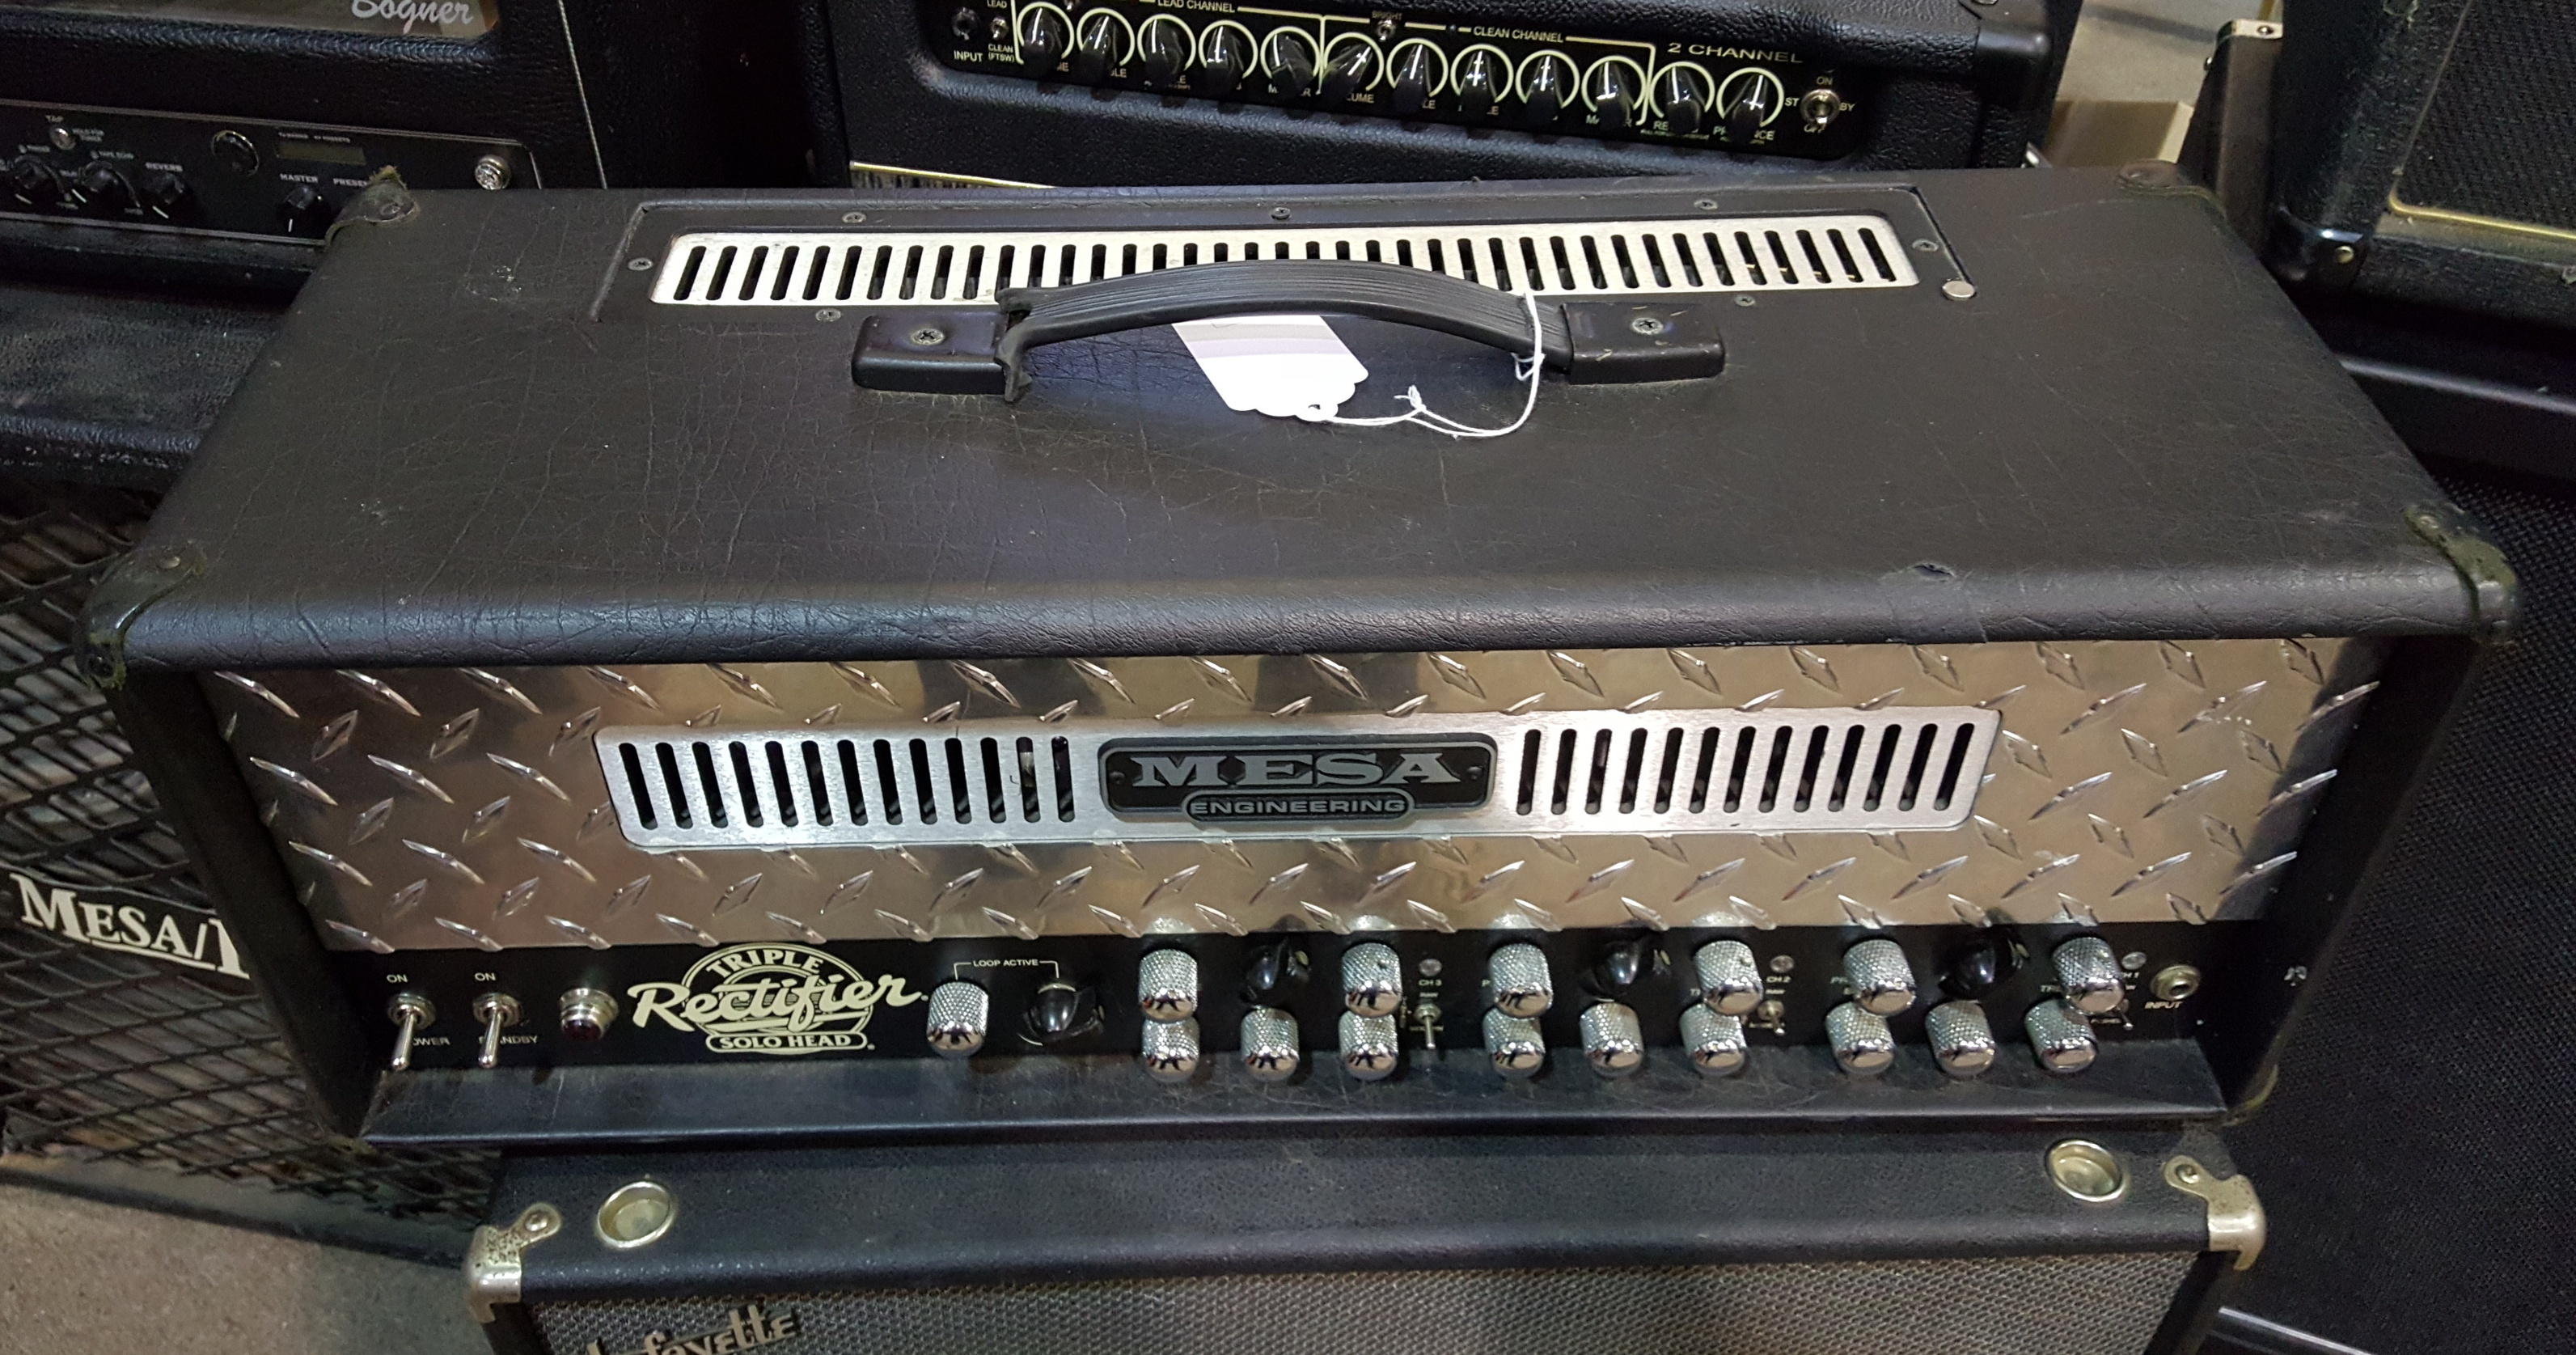 MESA BOOGIE TRIPLE RECTIFIER 150-WATT TUBE GUITAR AMP HEAD